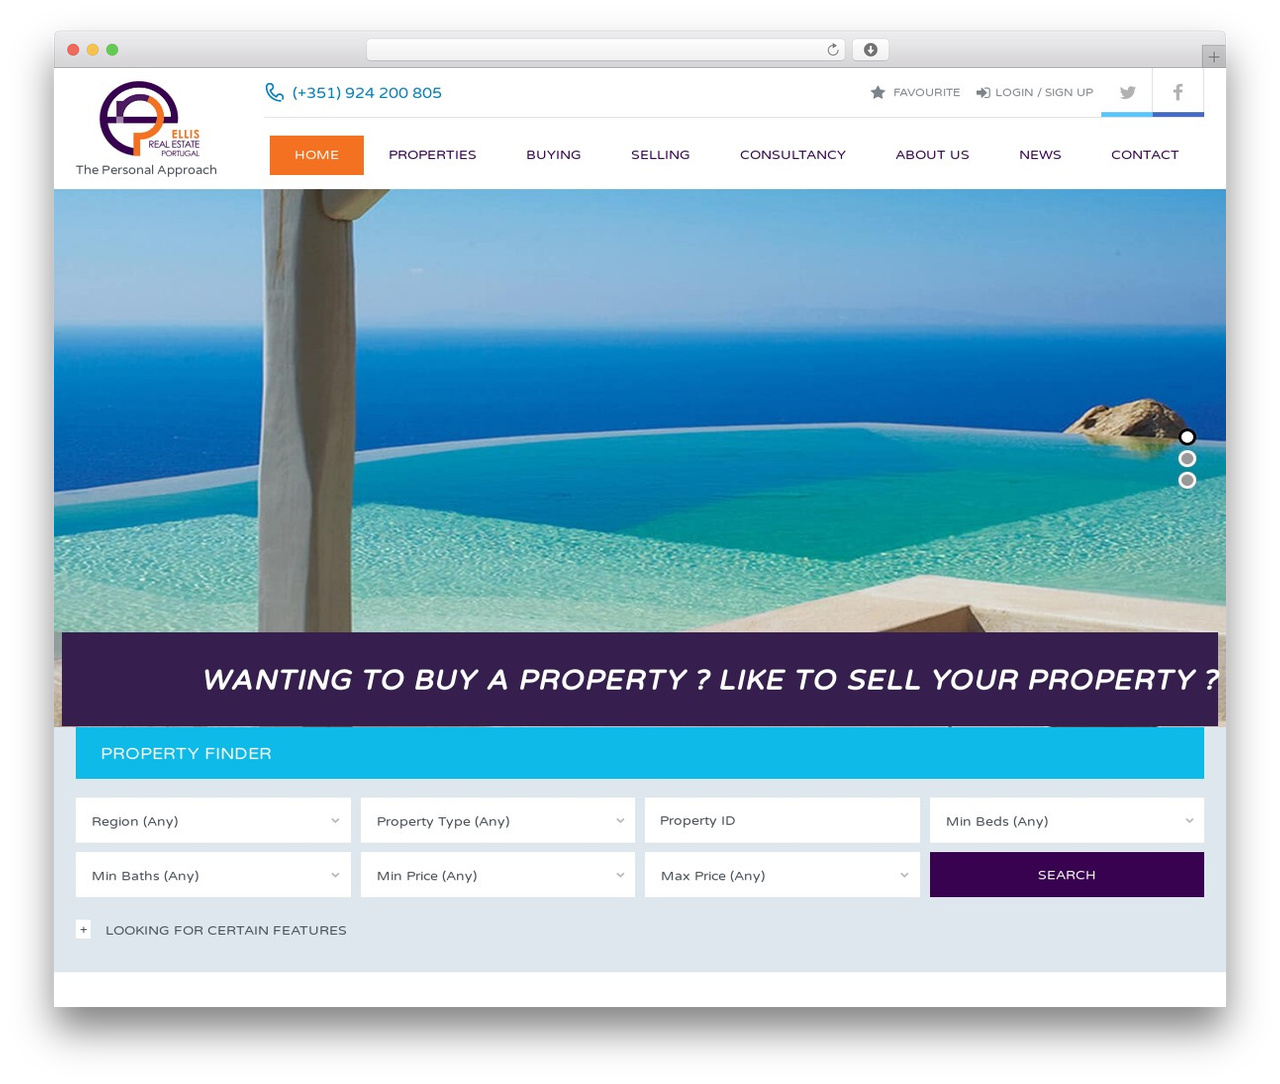 ellis-real-estate real estate WordPress theme - ellisrealestateportugal.com